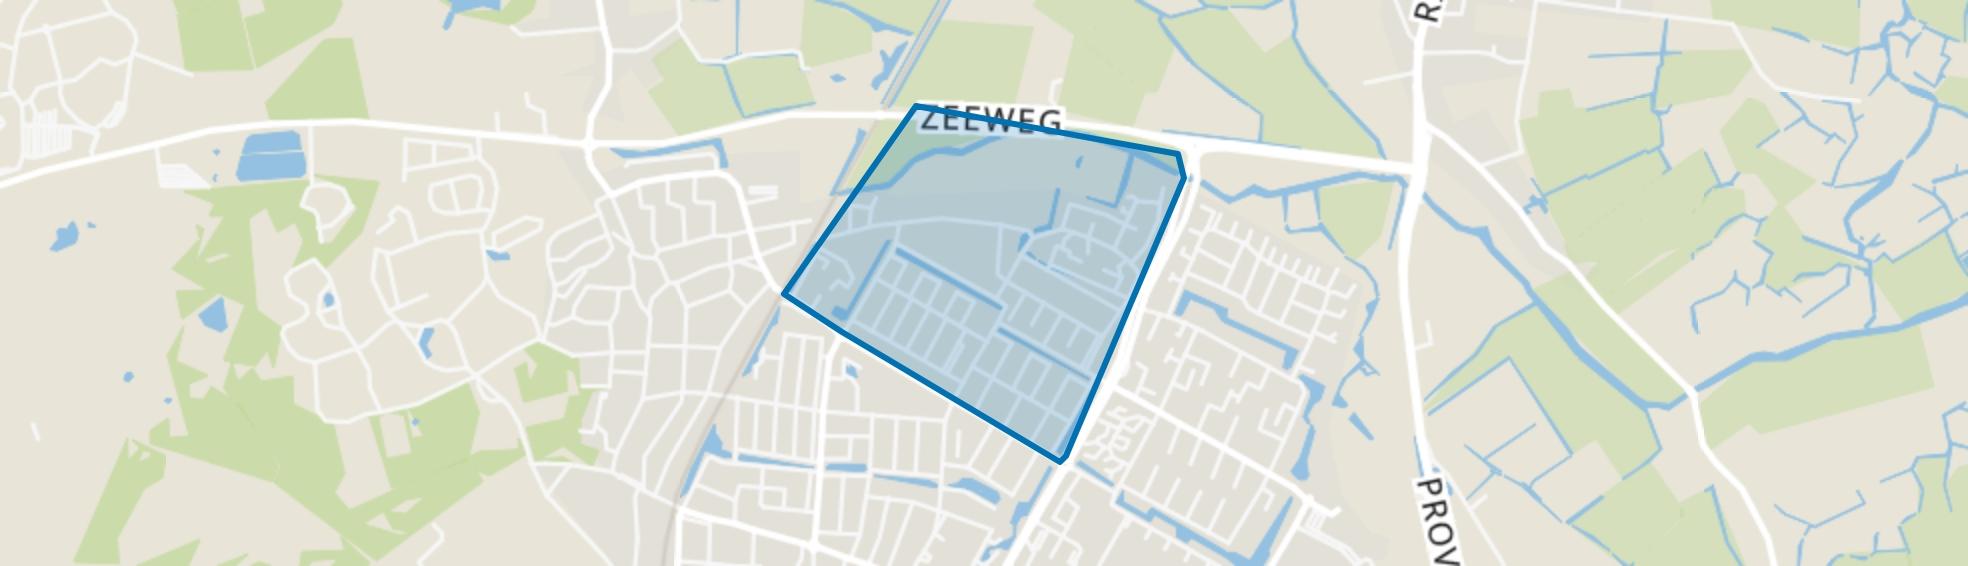 Kooiweg, Castricum map